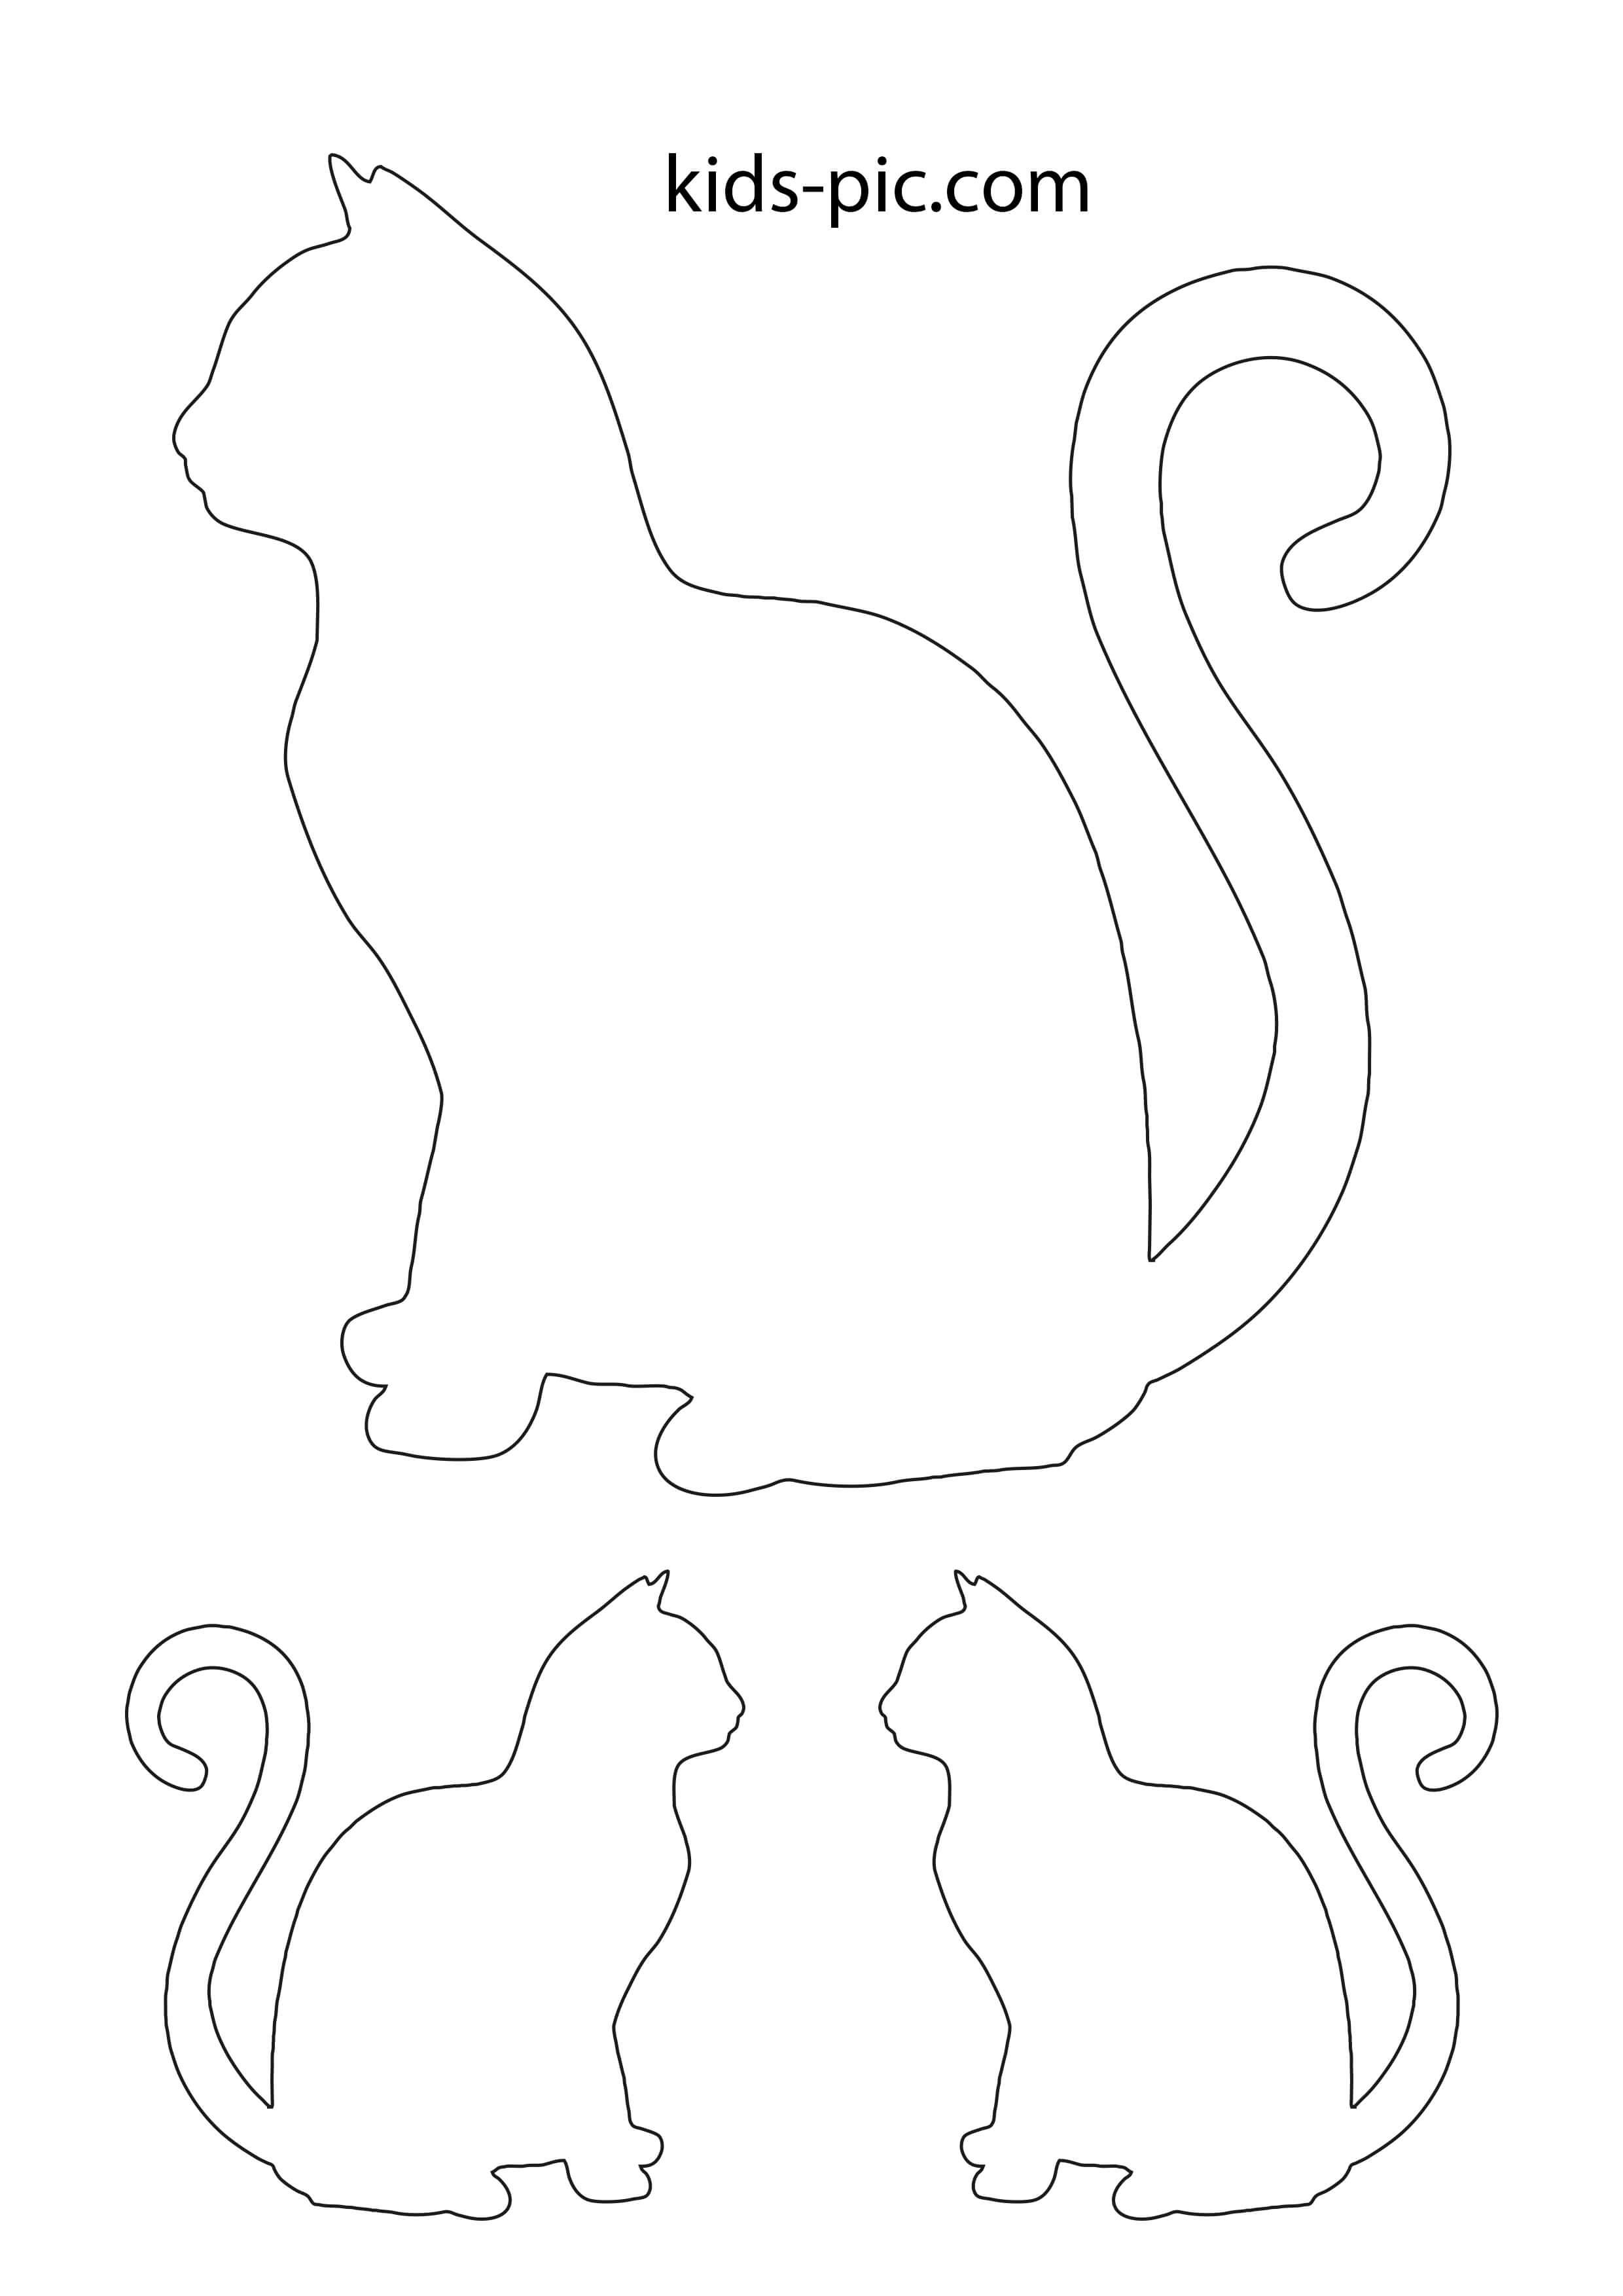 Шаблон кота для открытки